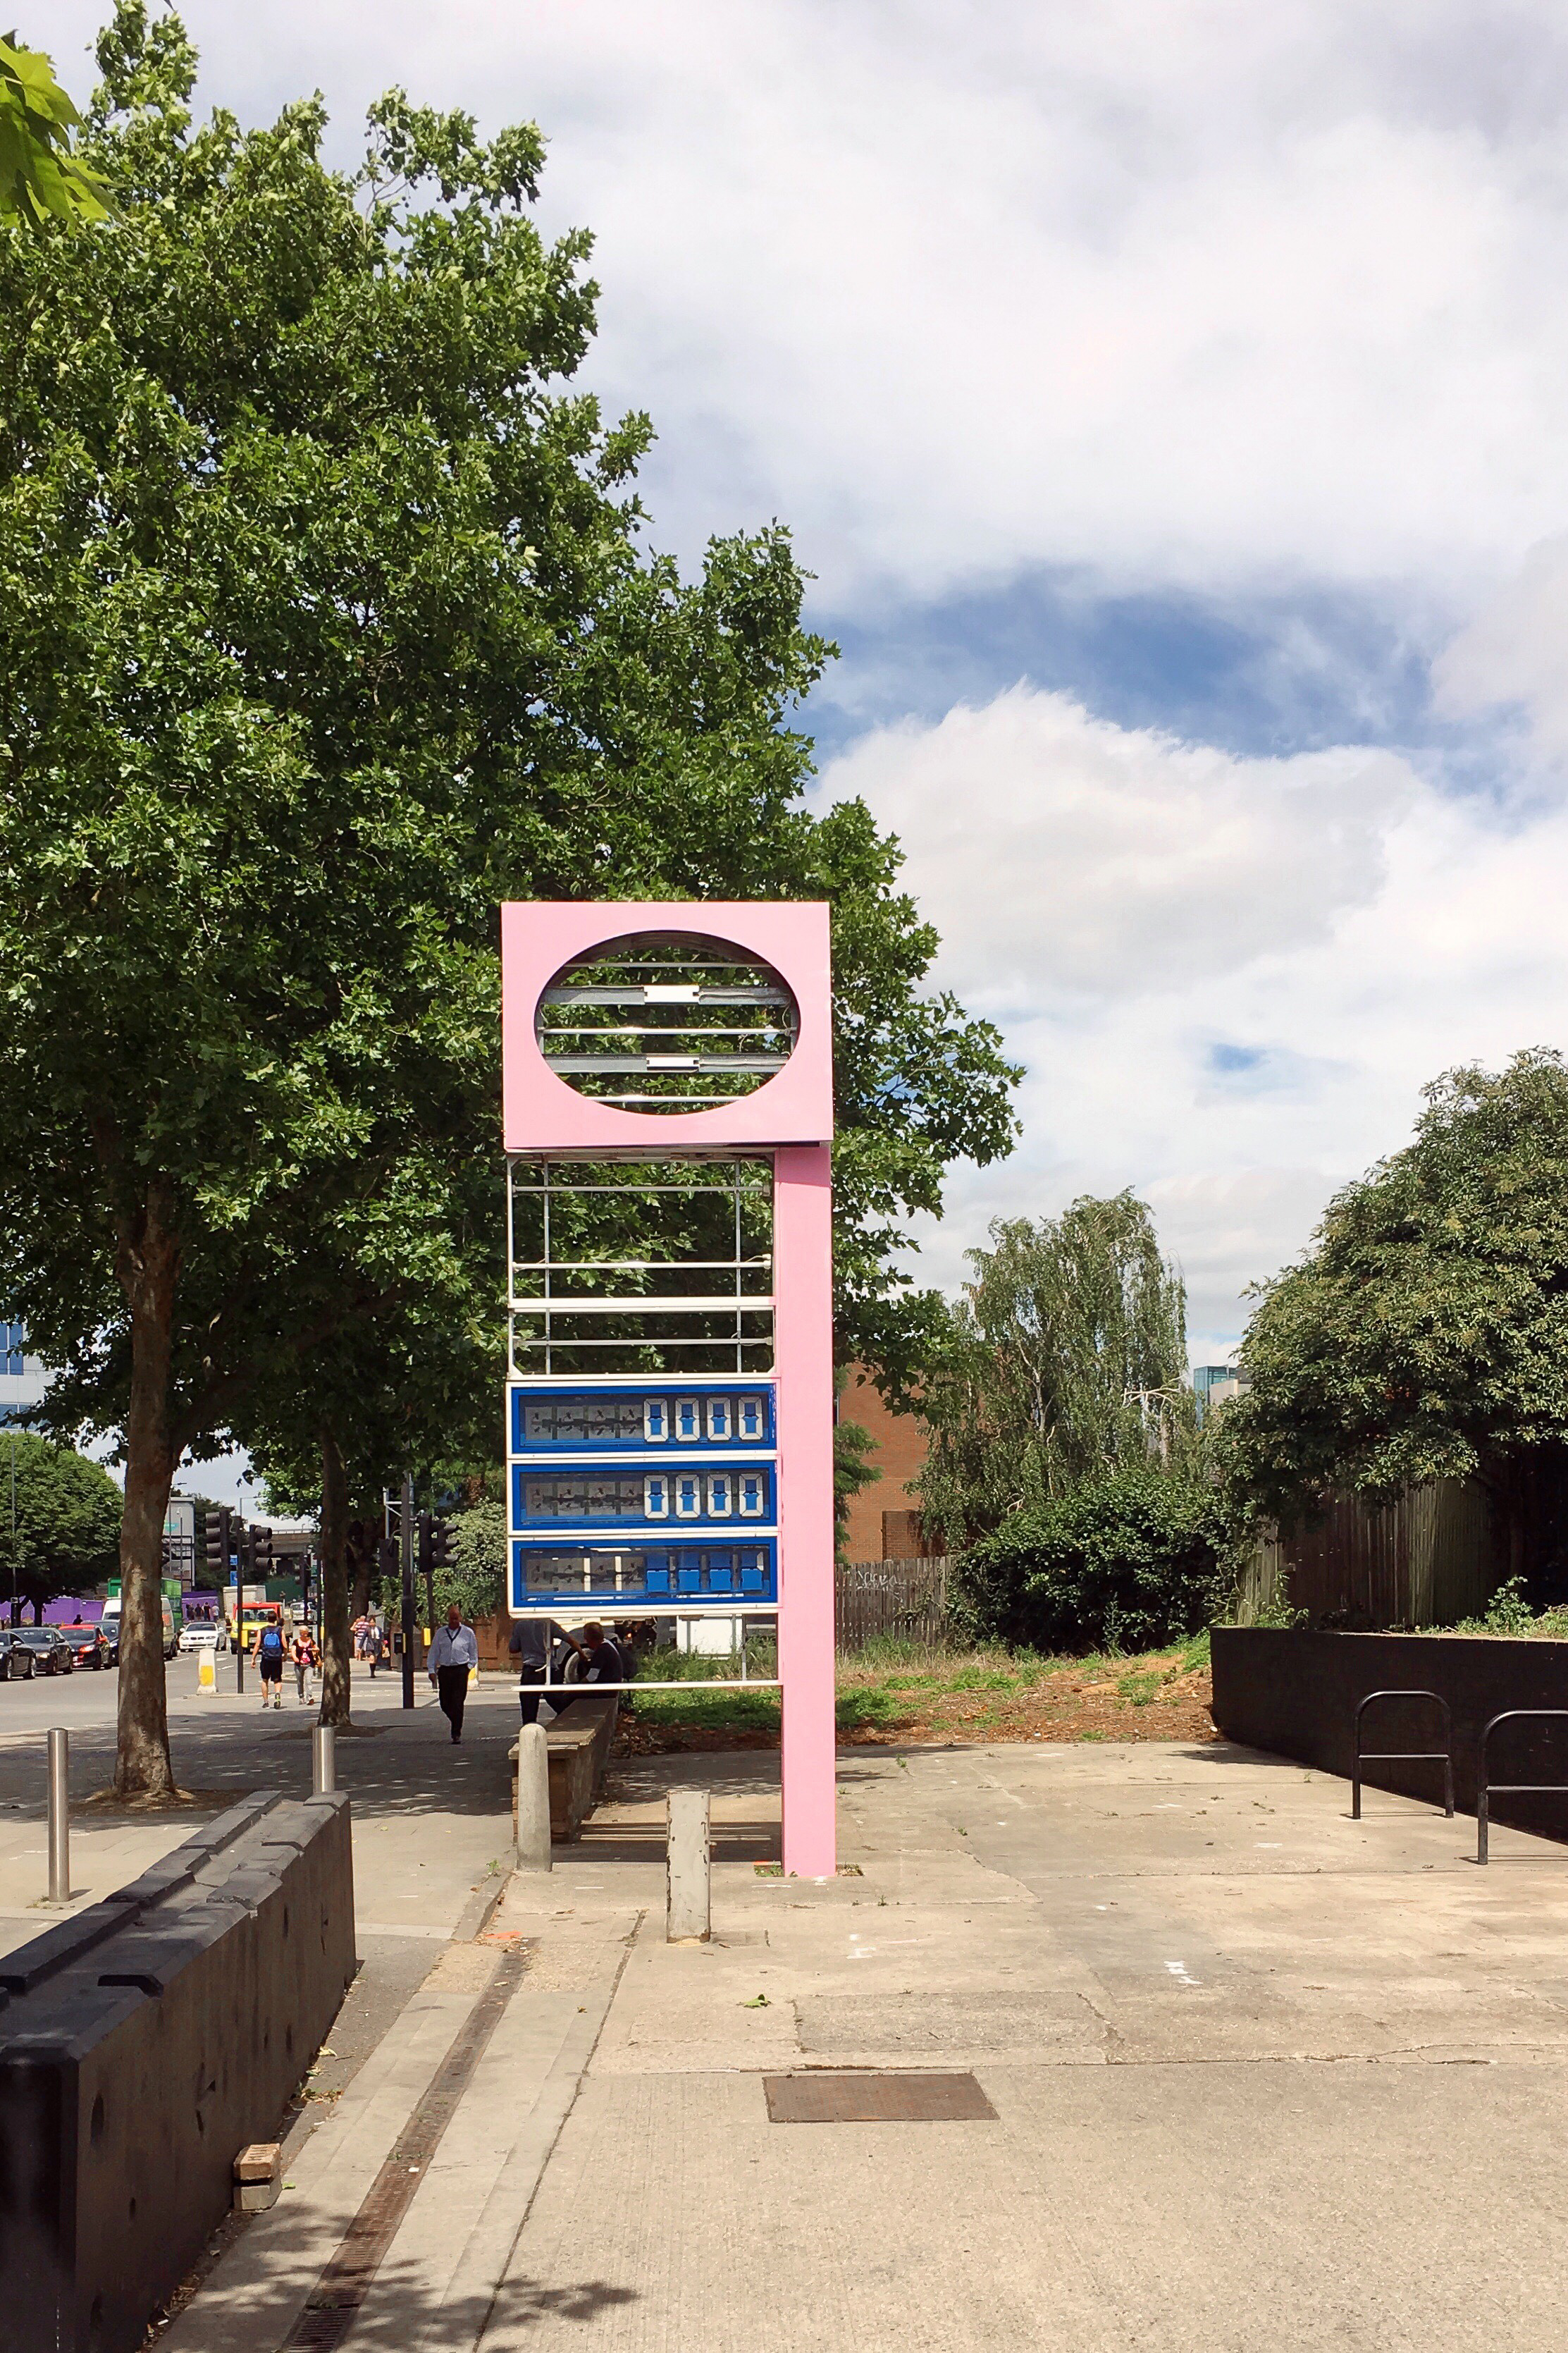 Credit: Yasumi Location: White City, London